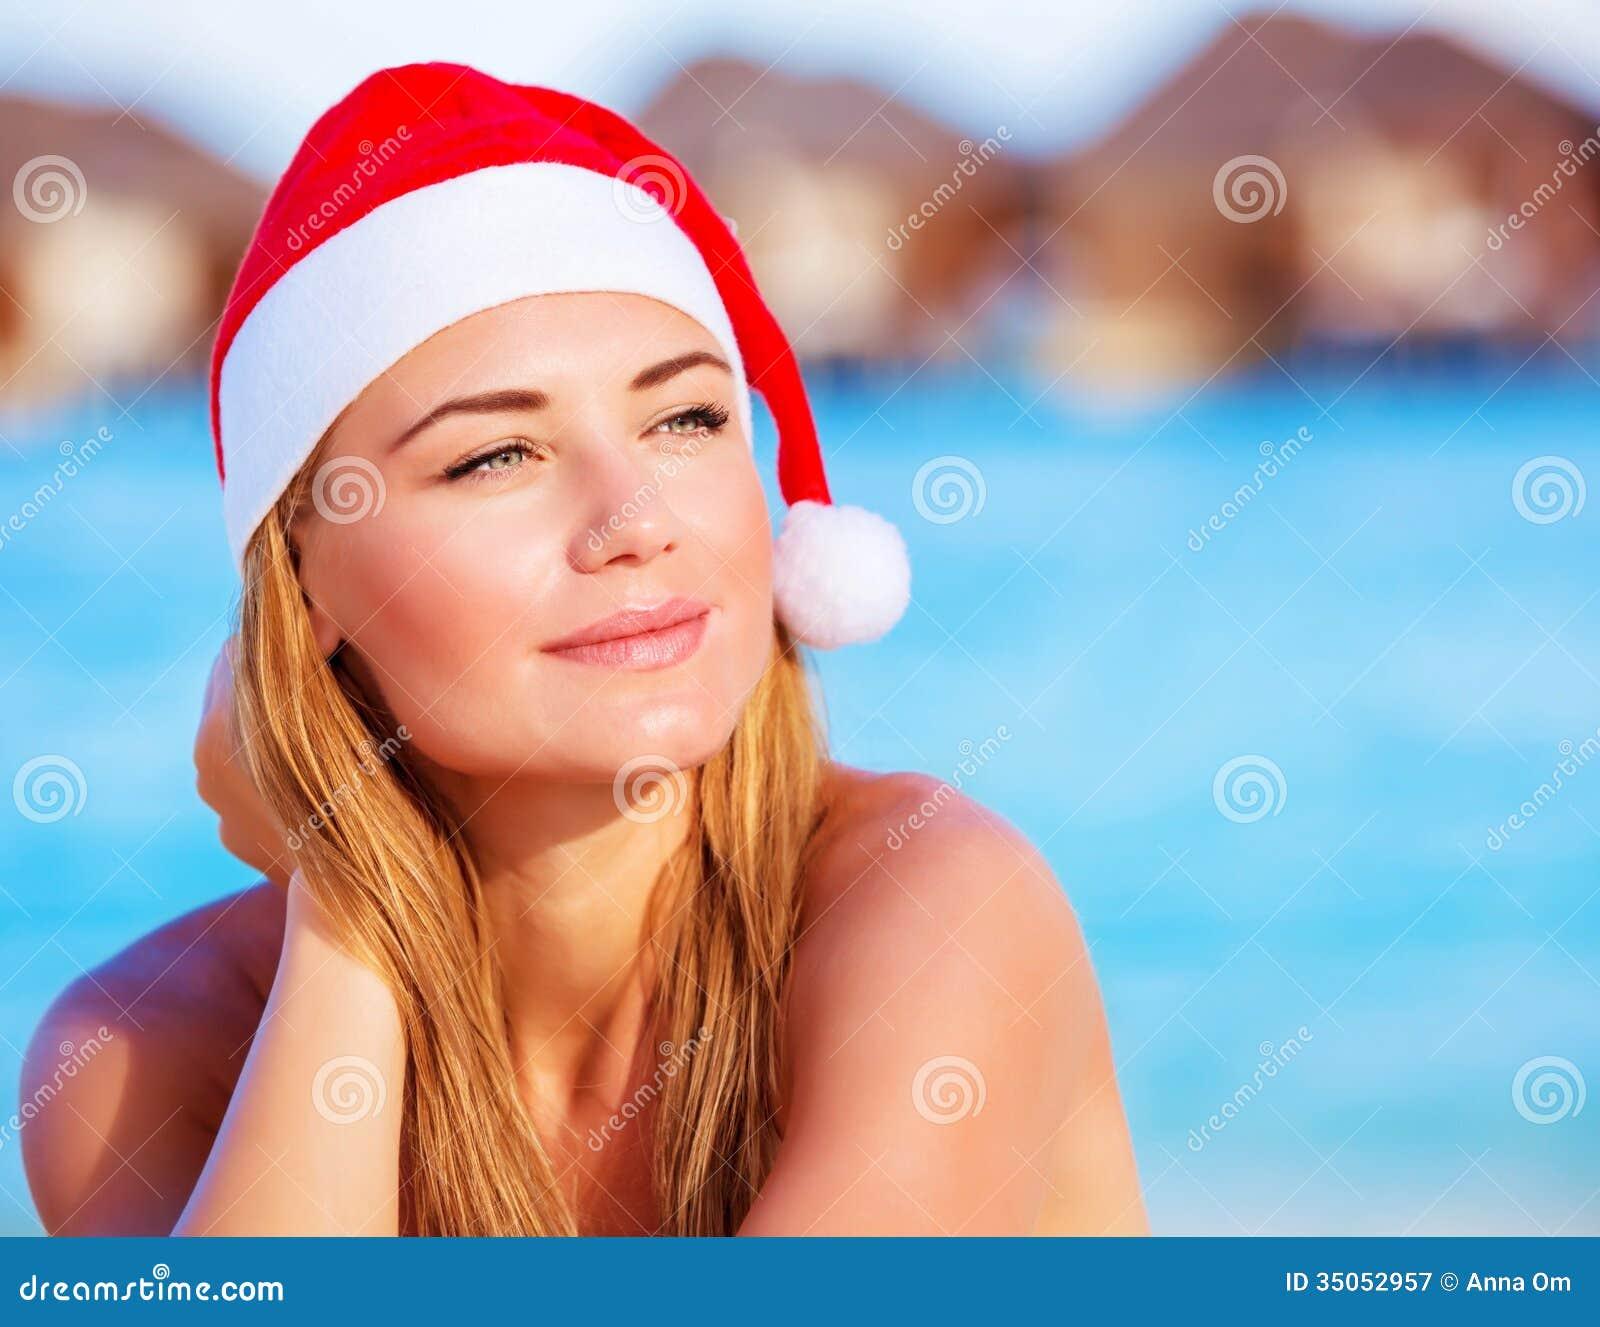 Portrait of cute woman wearing red santa hat celebrating christmas